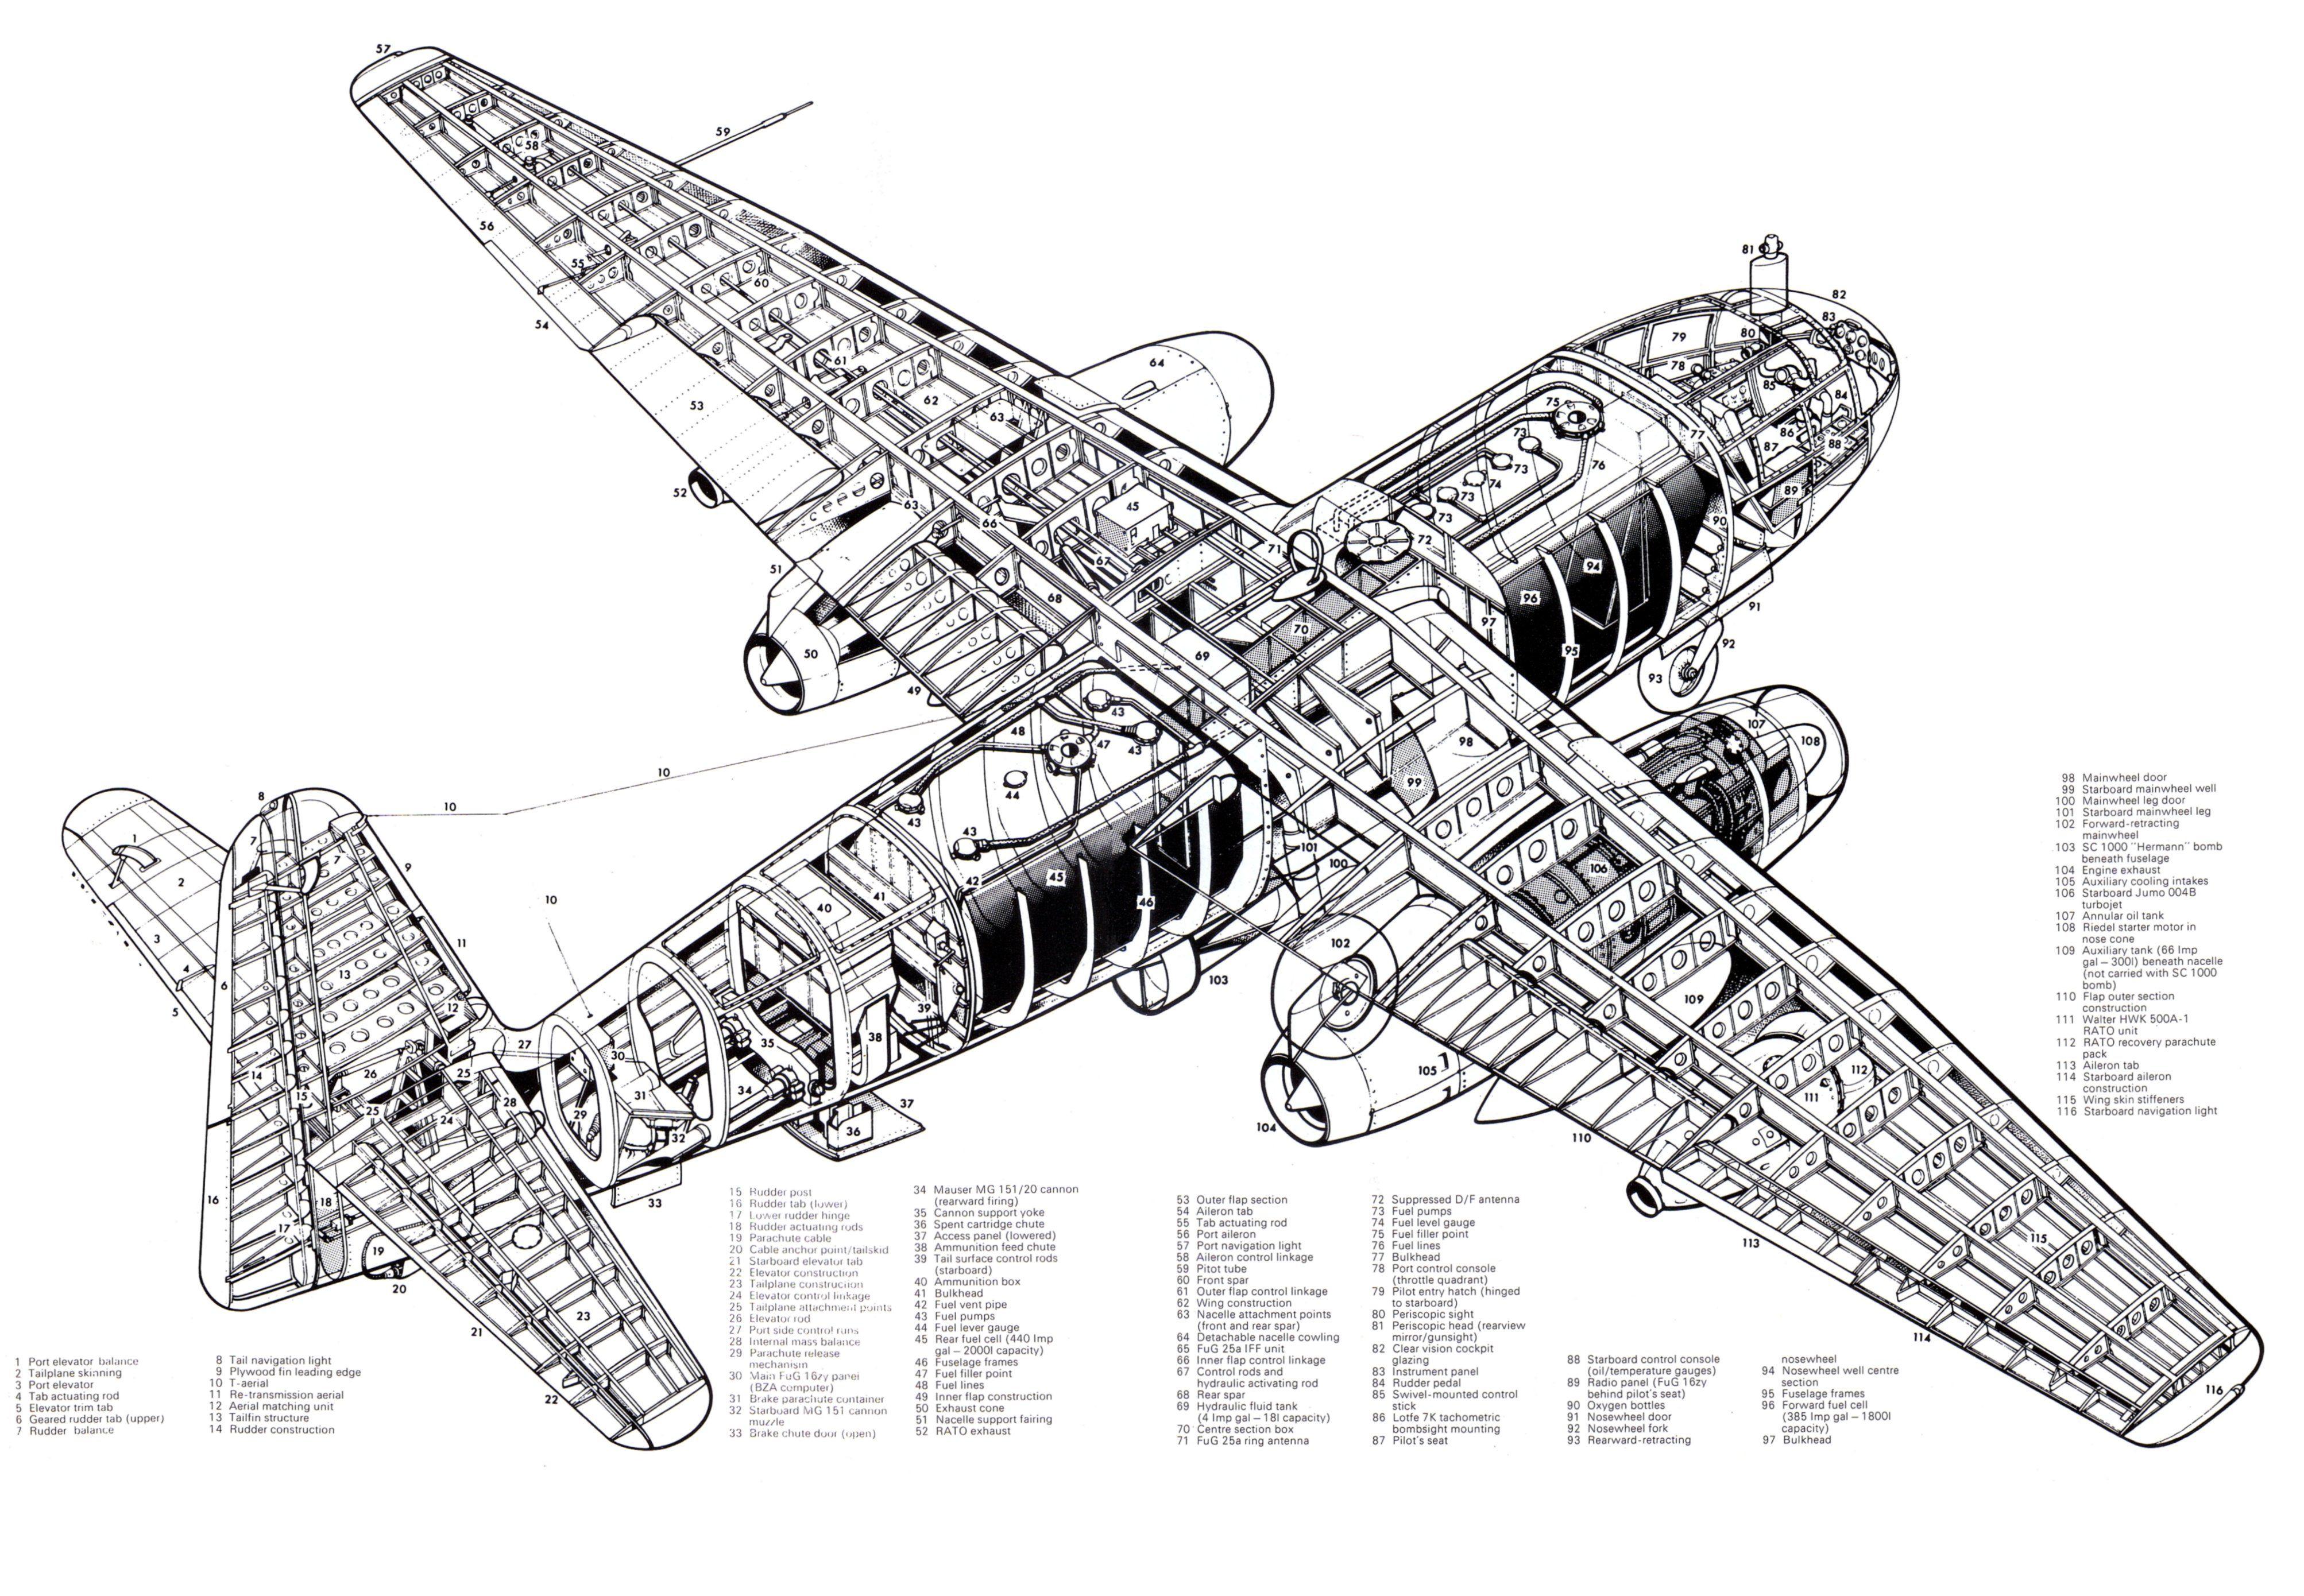 Arado Ar 234 World S First Operational Jeter